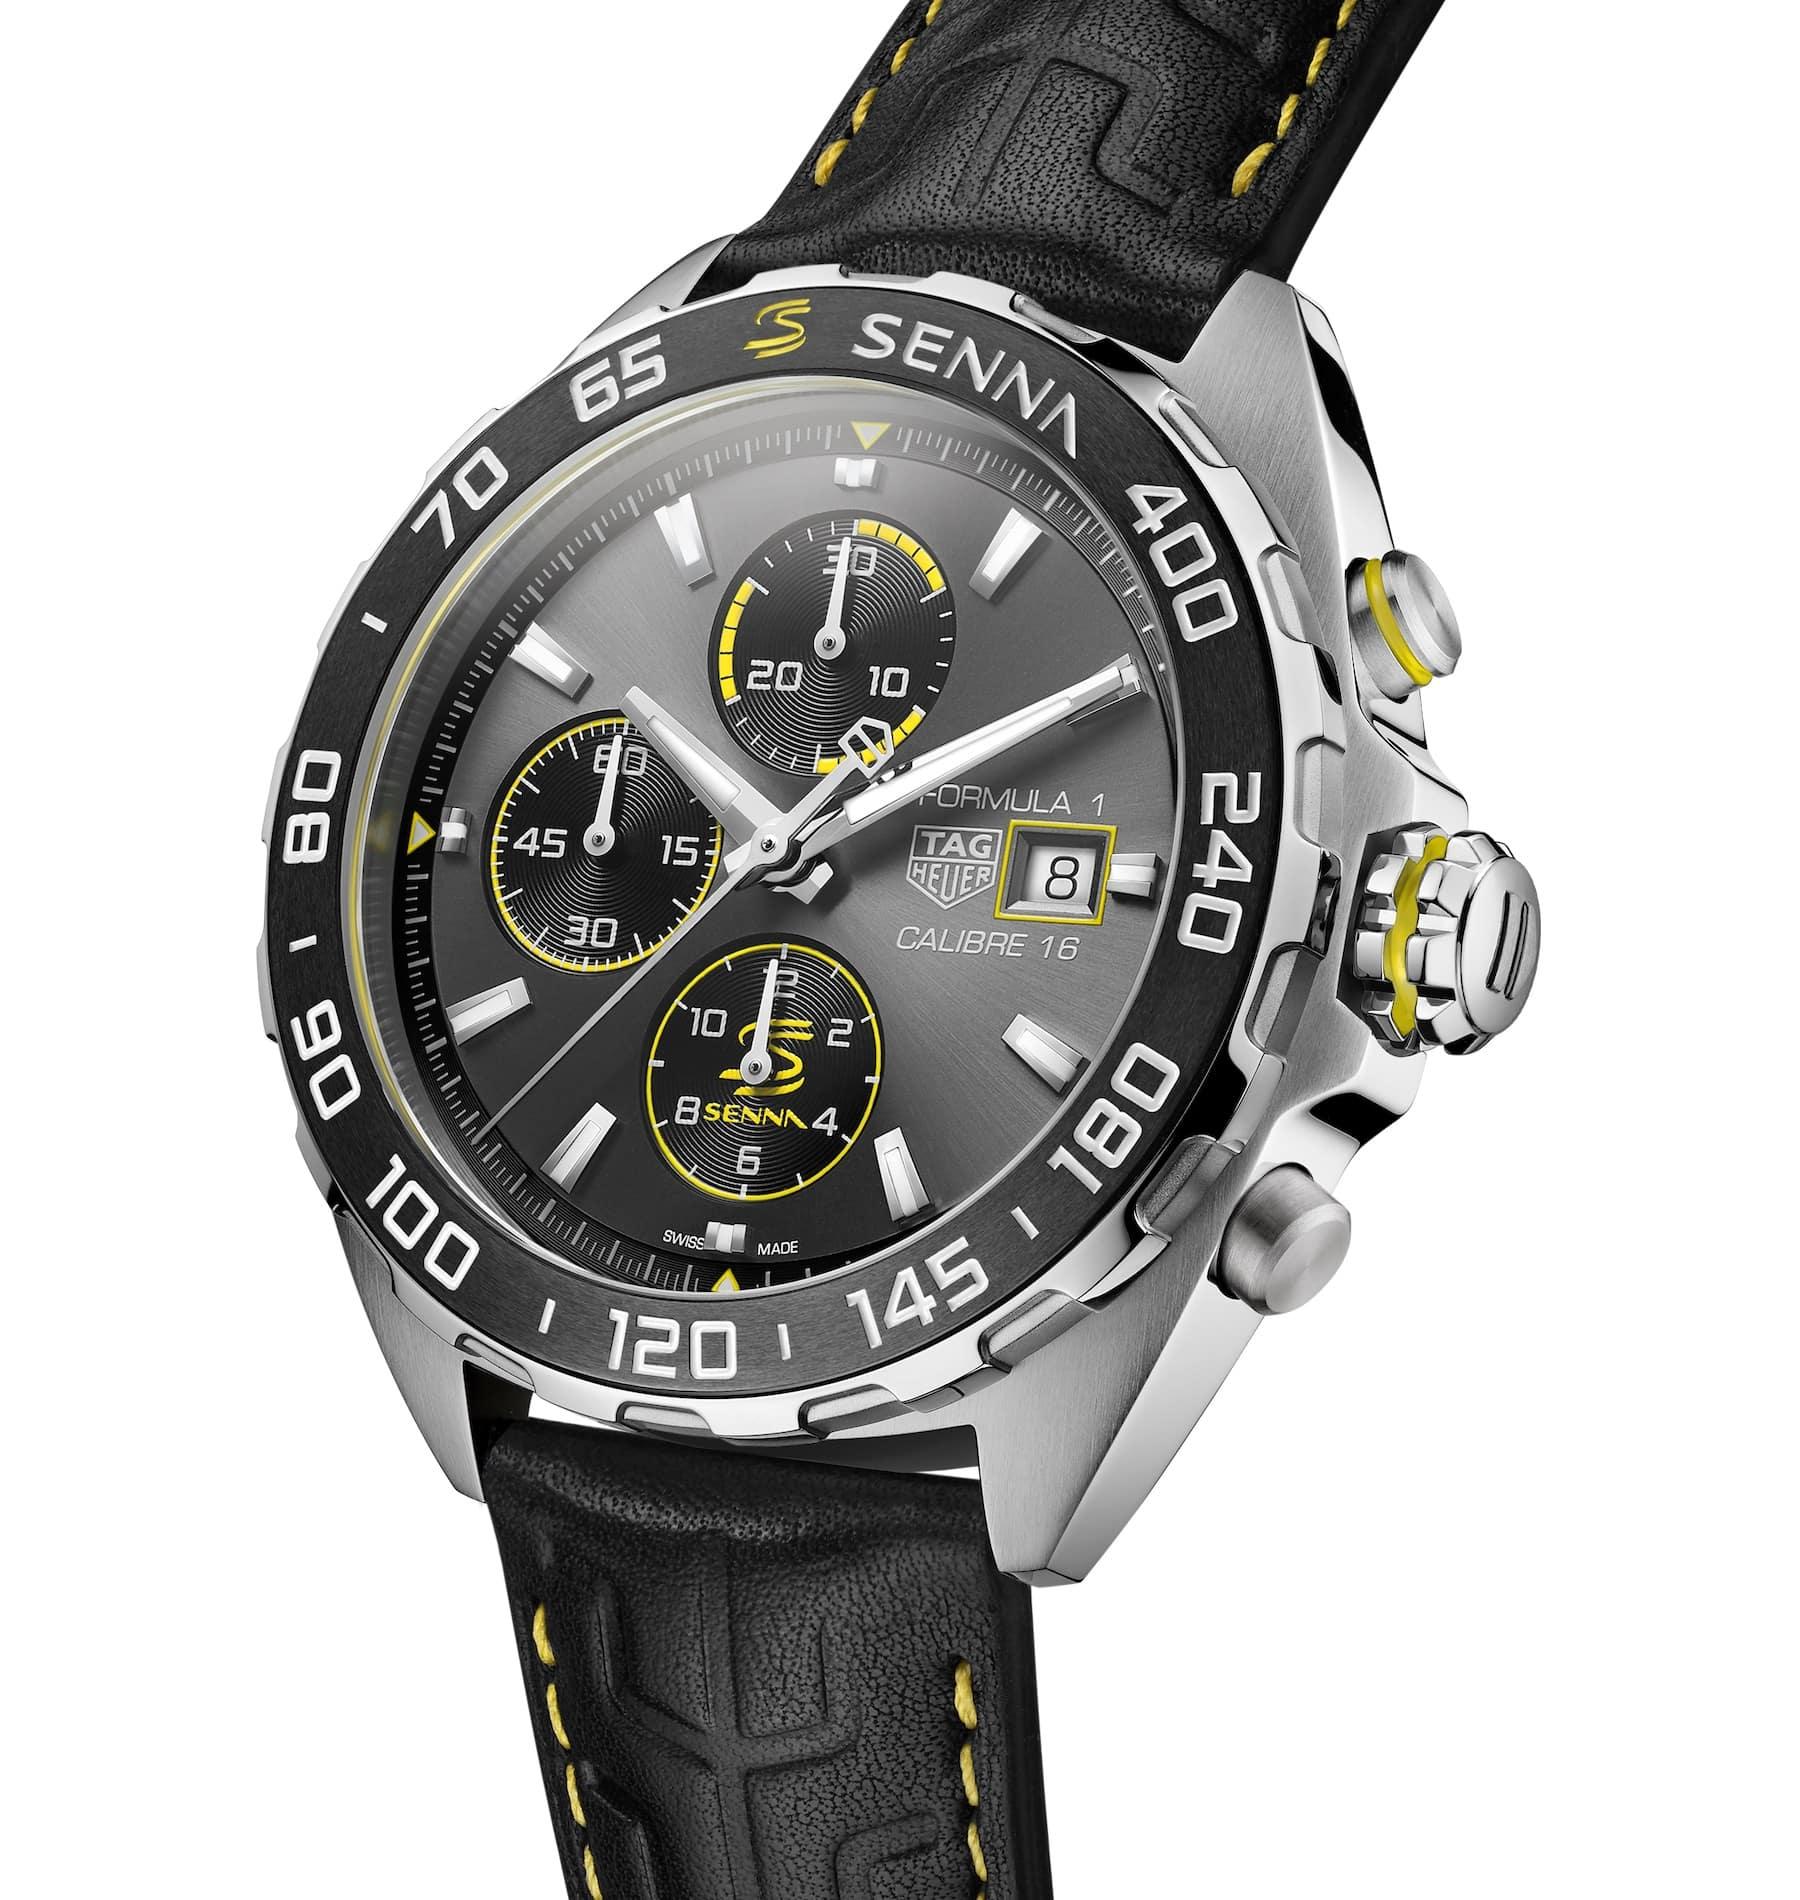 TAG Heuer Formula 1 Senna Special Edition 2020 automatic chronograph 5 min